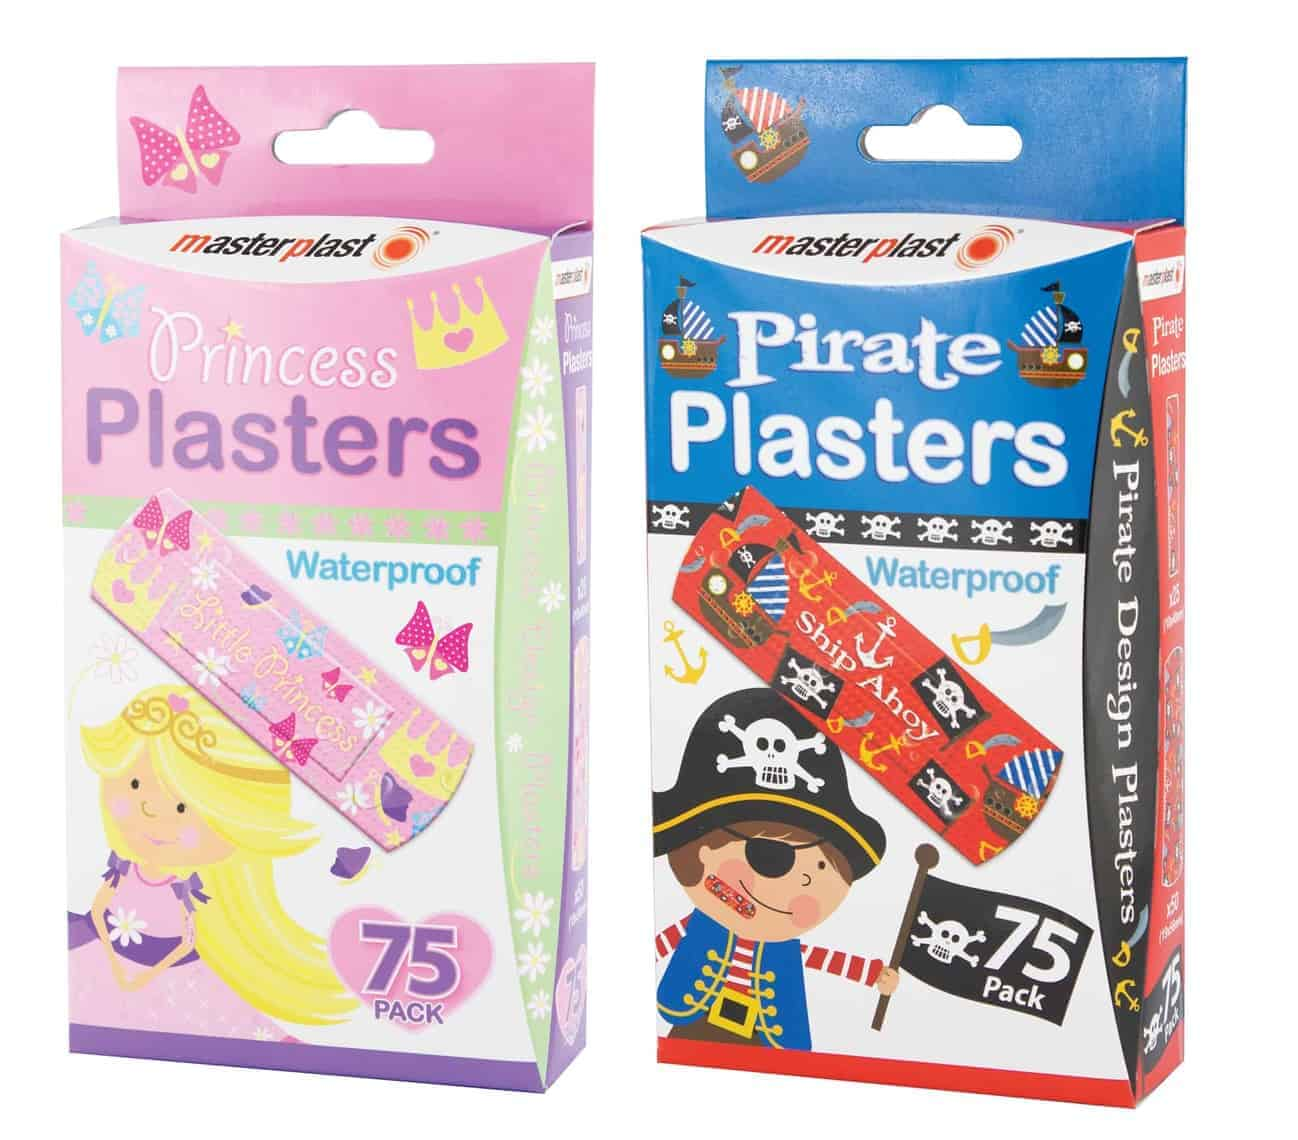 Master Plast Pirate & Princess Plasters 75Pk